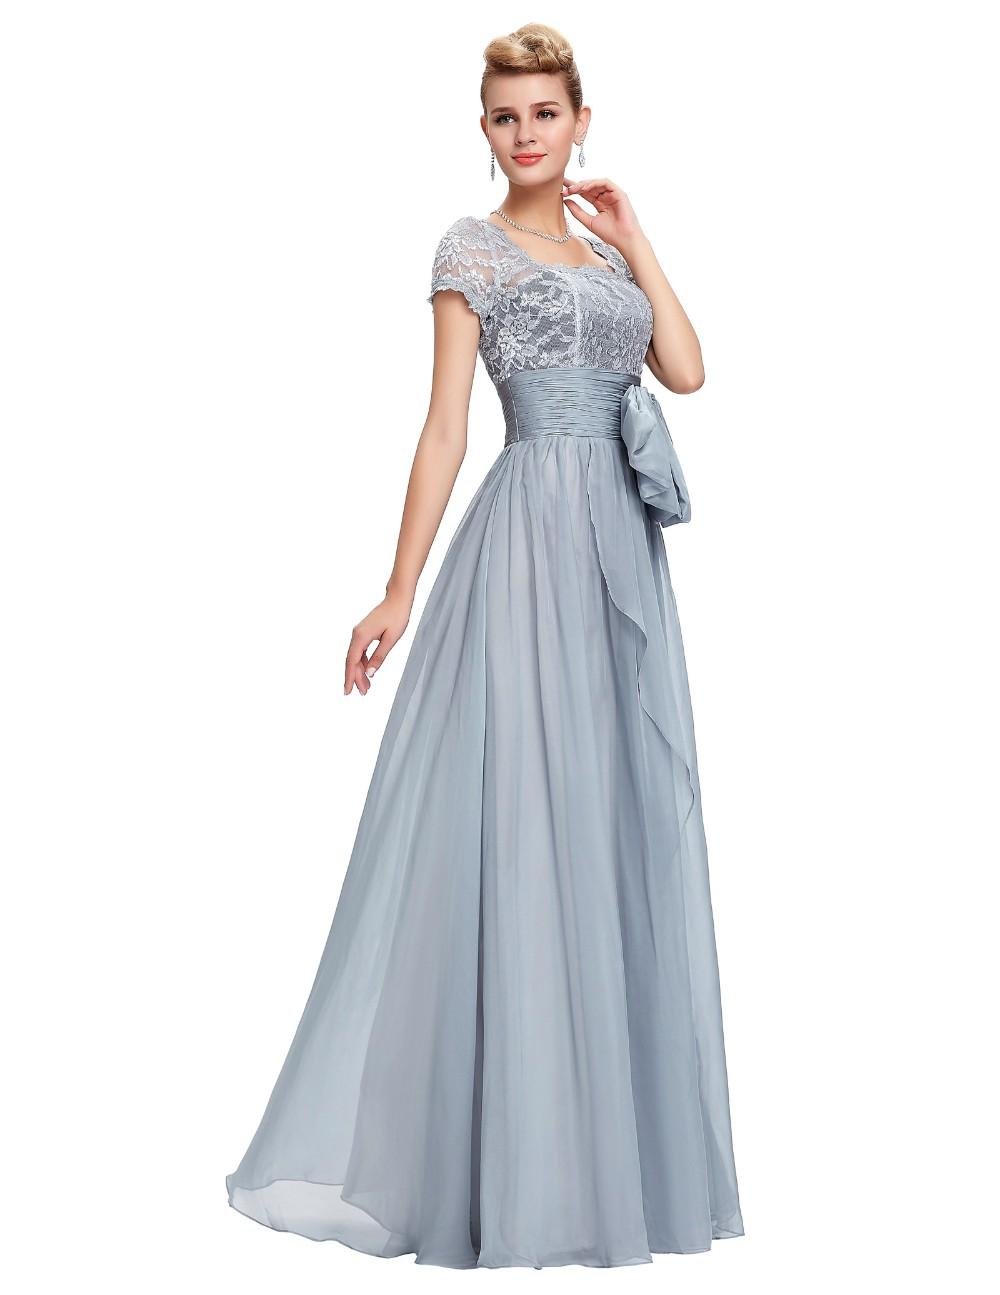 Grace Karin Chiffon Lace Elegant Long Evening Dresses Grey Formal Evening Gowns robe de soiree longue GK4445 8